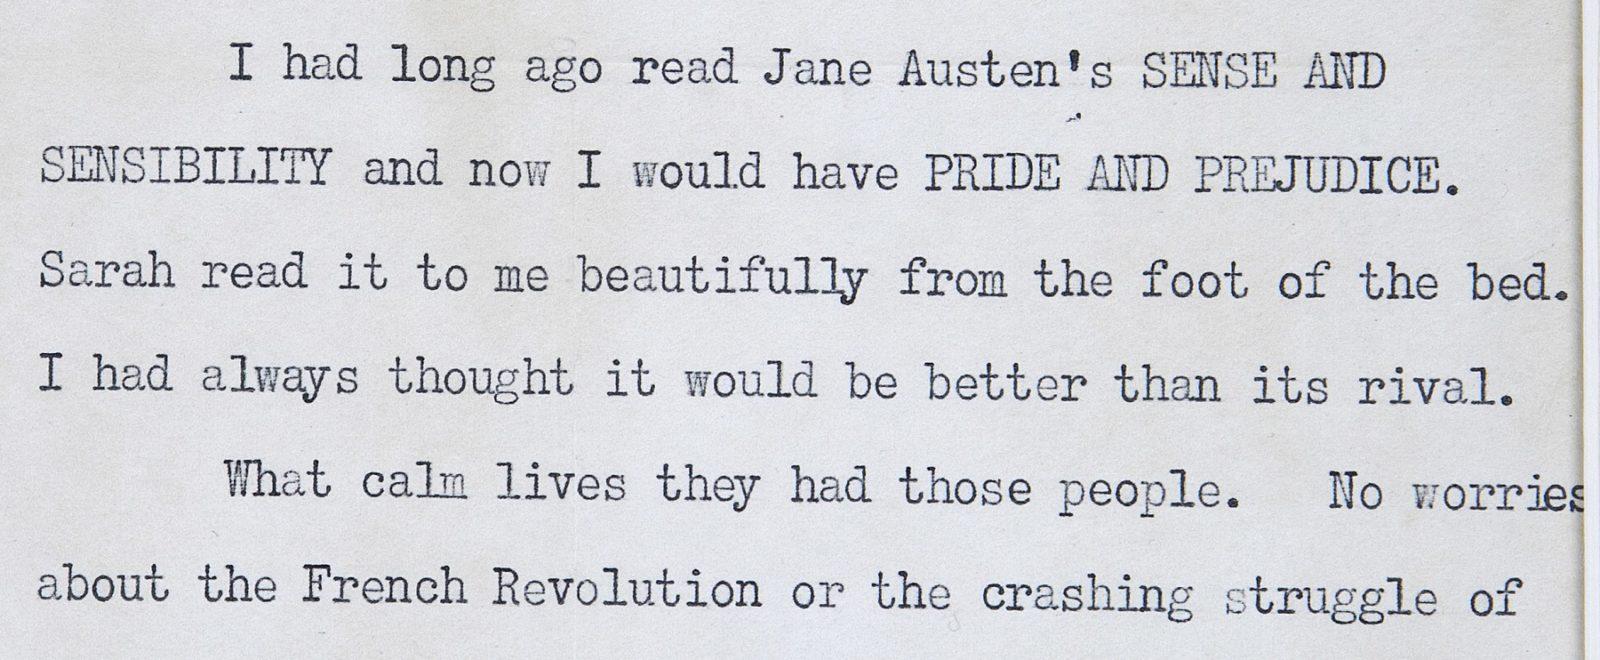 Winston Churchill memoir extract